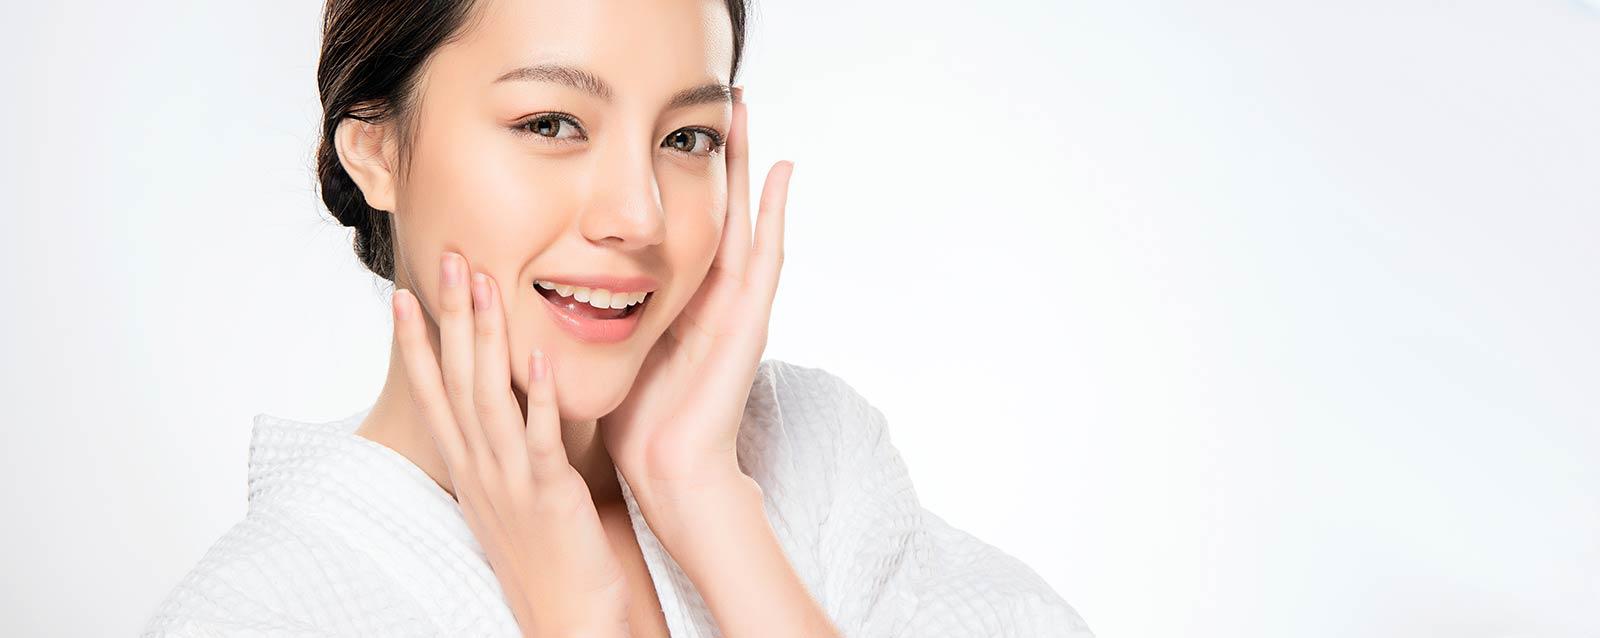 Protocolo: Microagulhamento Facial Limpeza de Pele